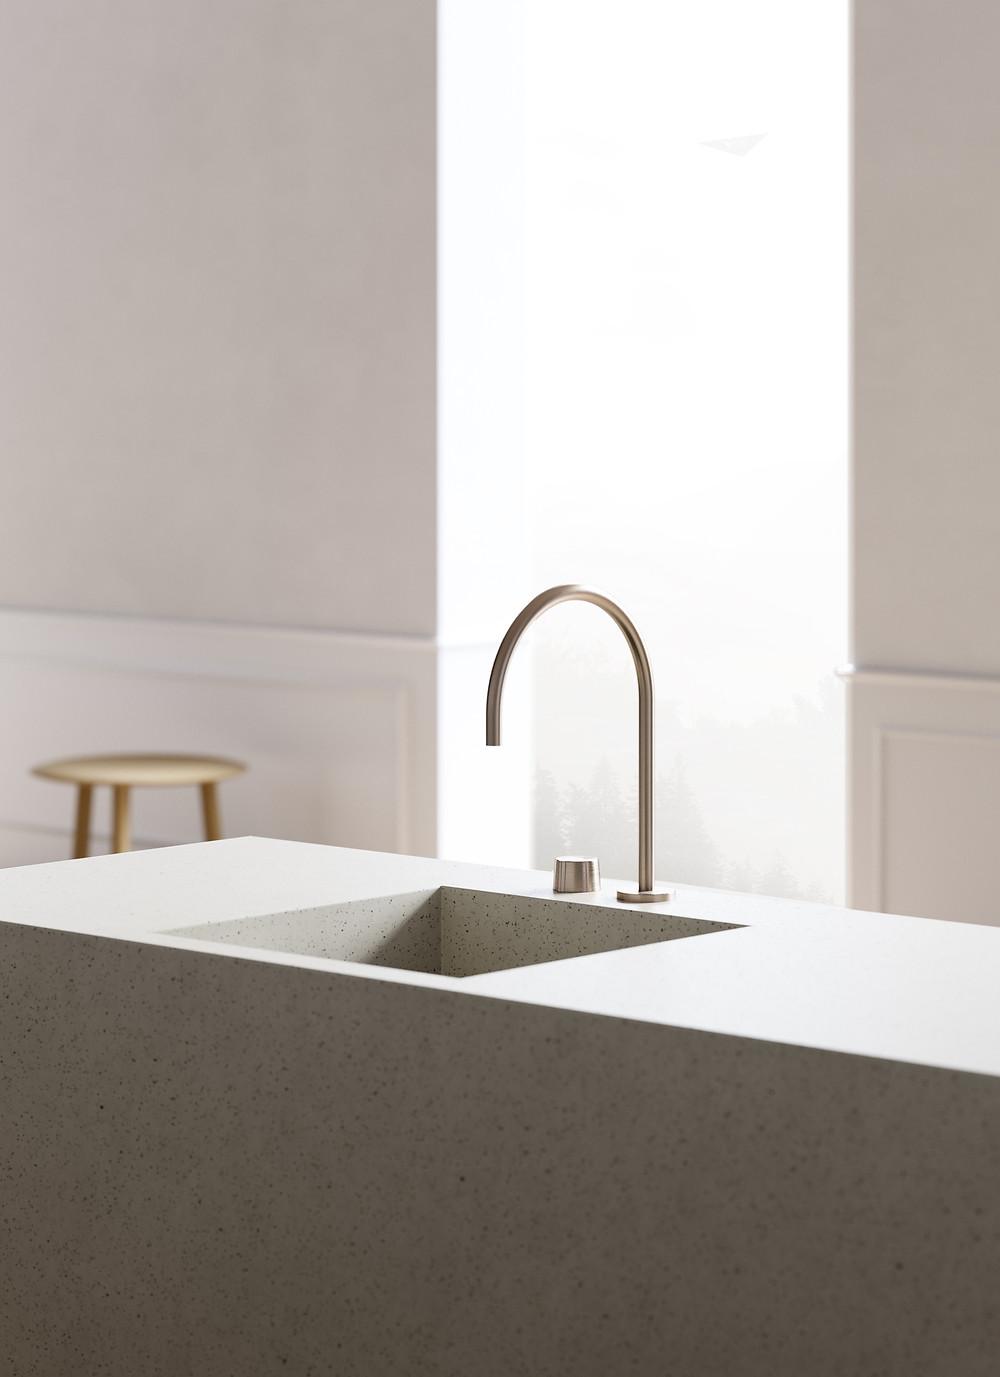 rendering minimalist faucet tap